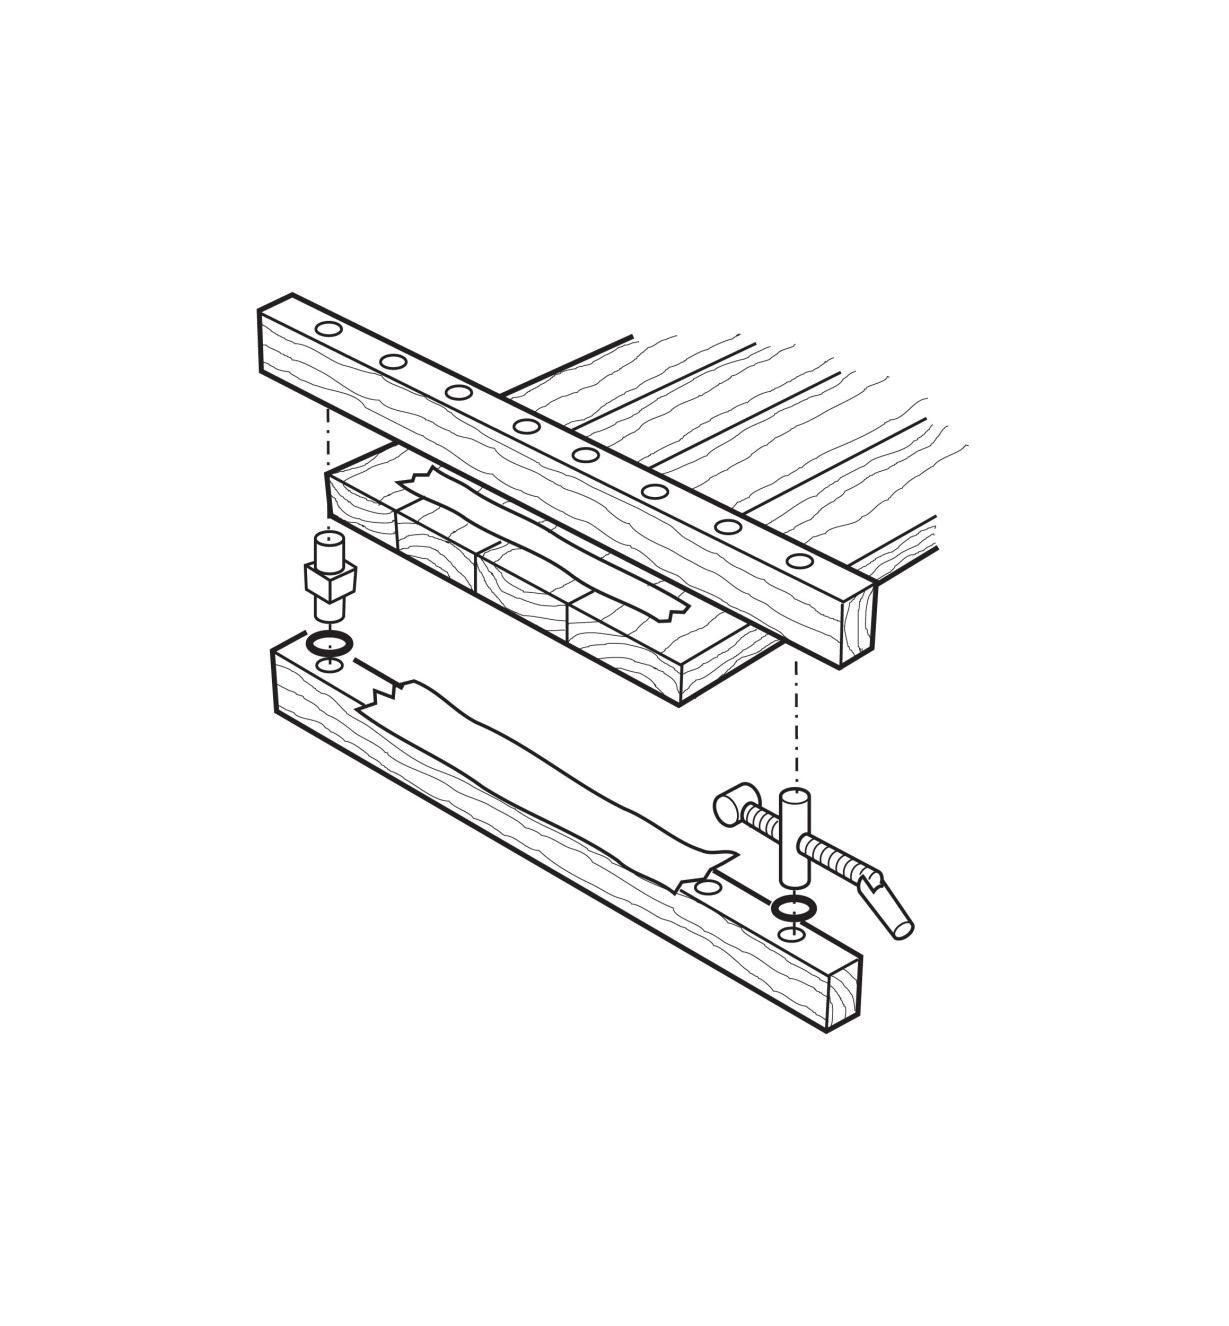 05G1601 - Panel Clamp